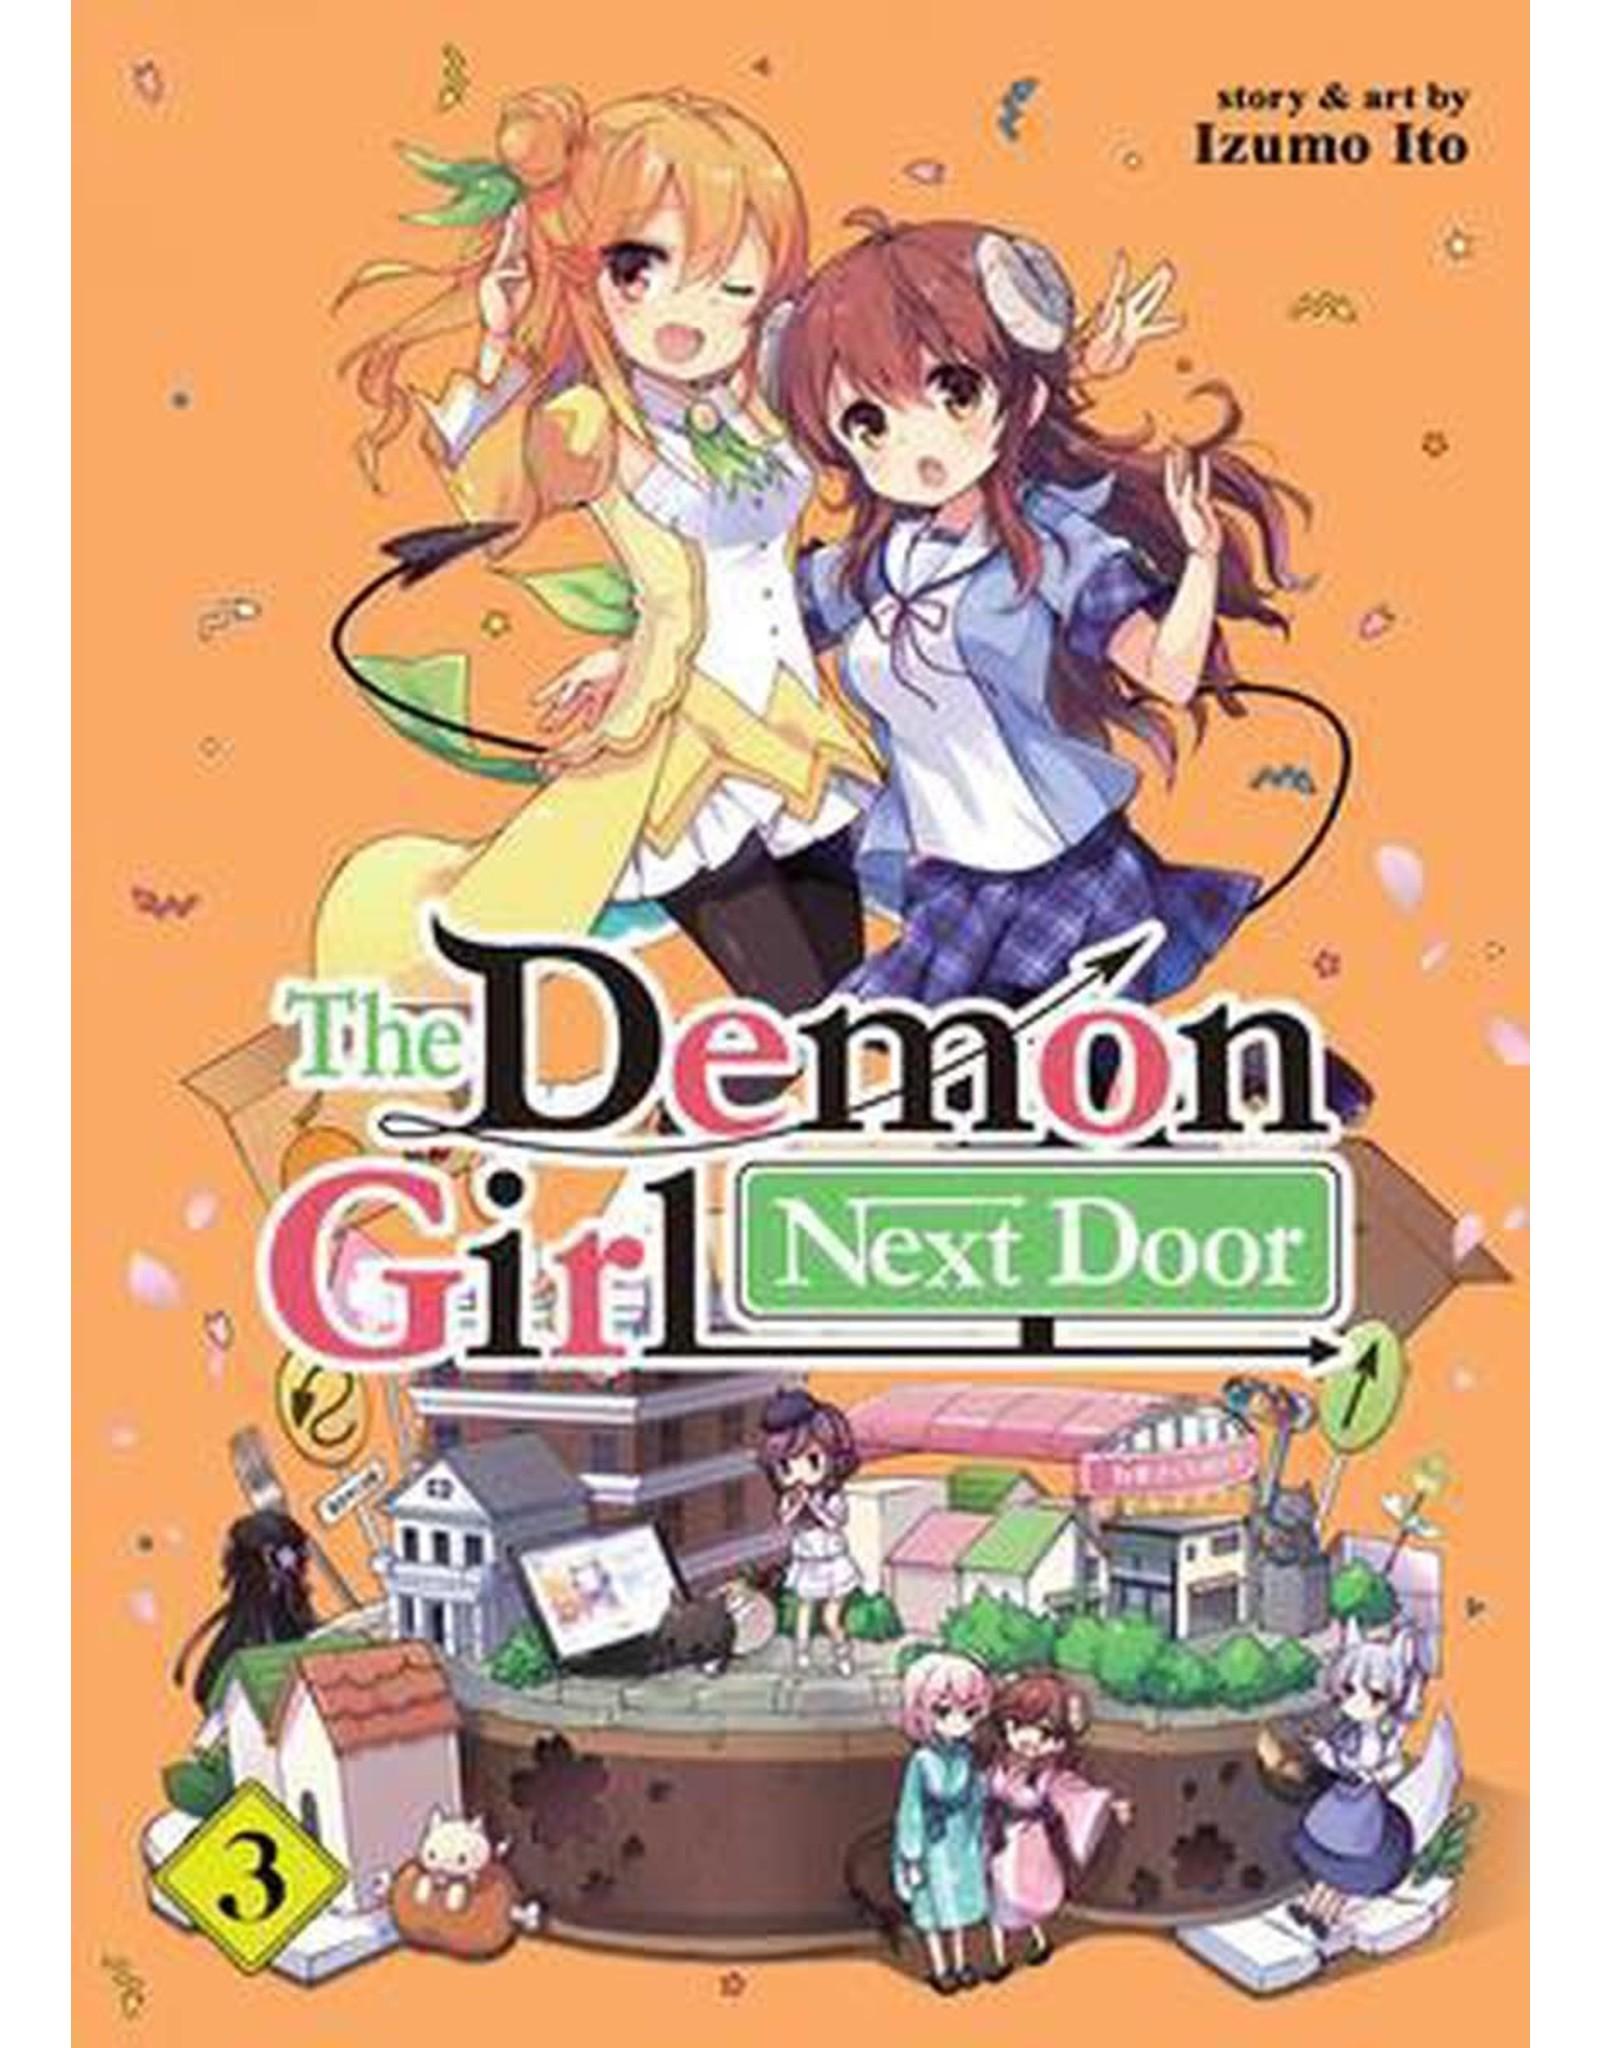 The Demon Girl Next Door 3 (English) - Manga